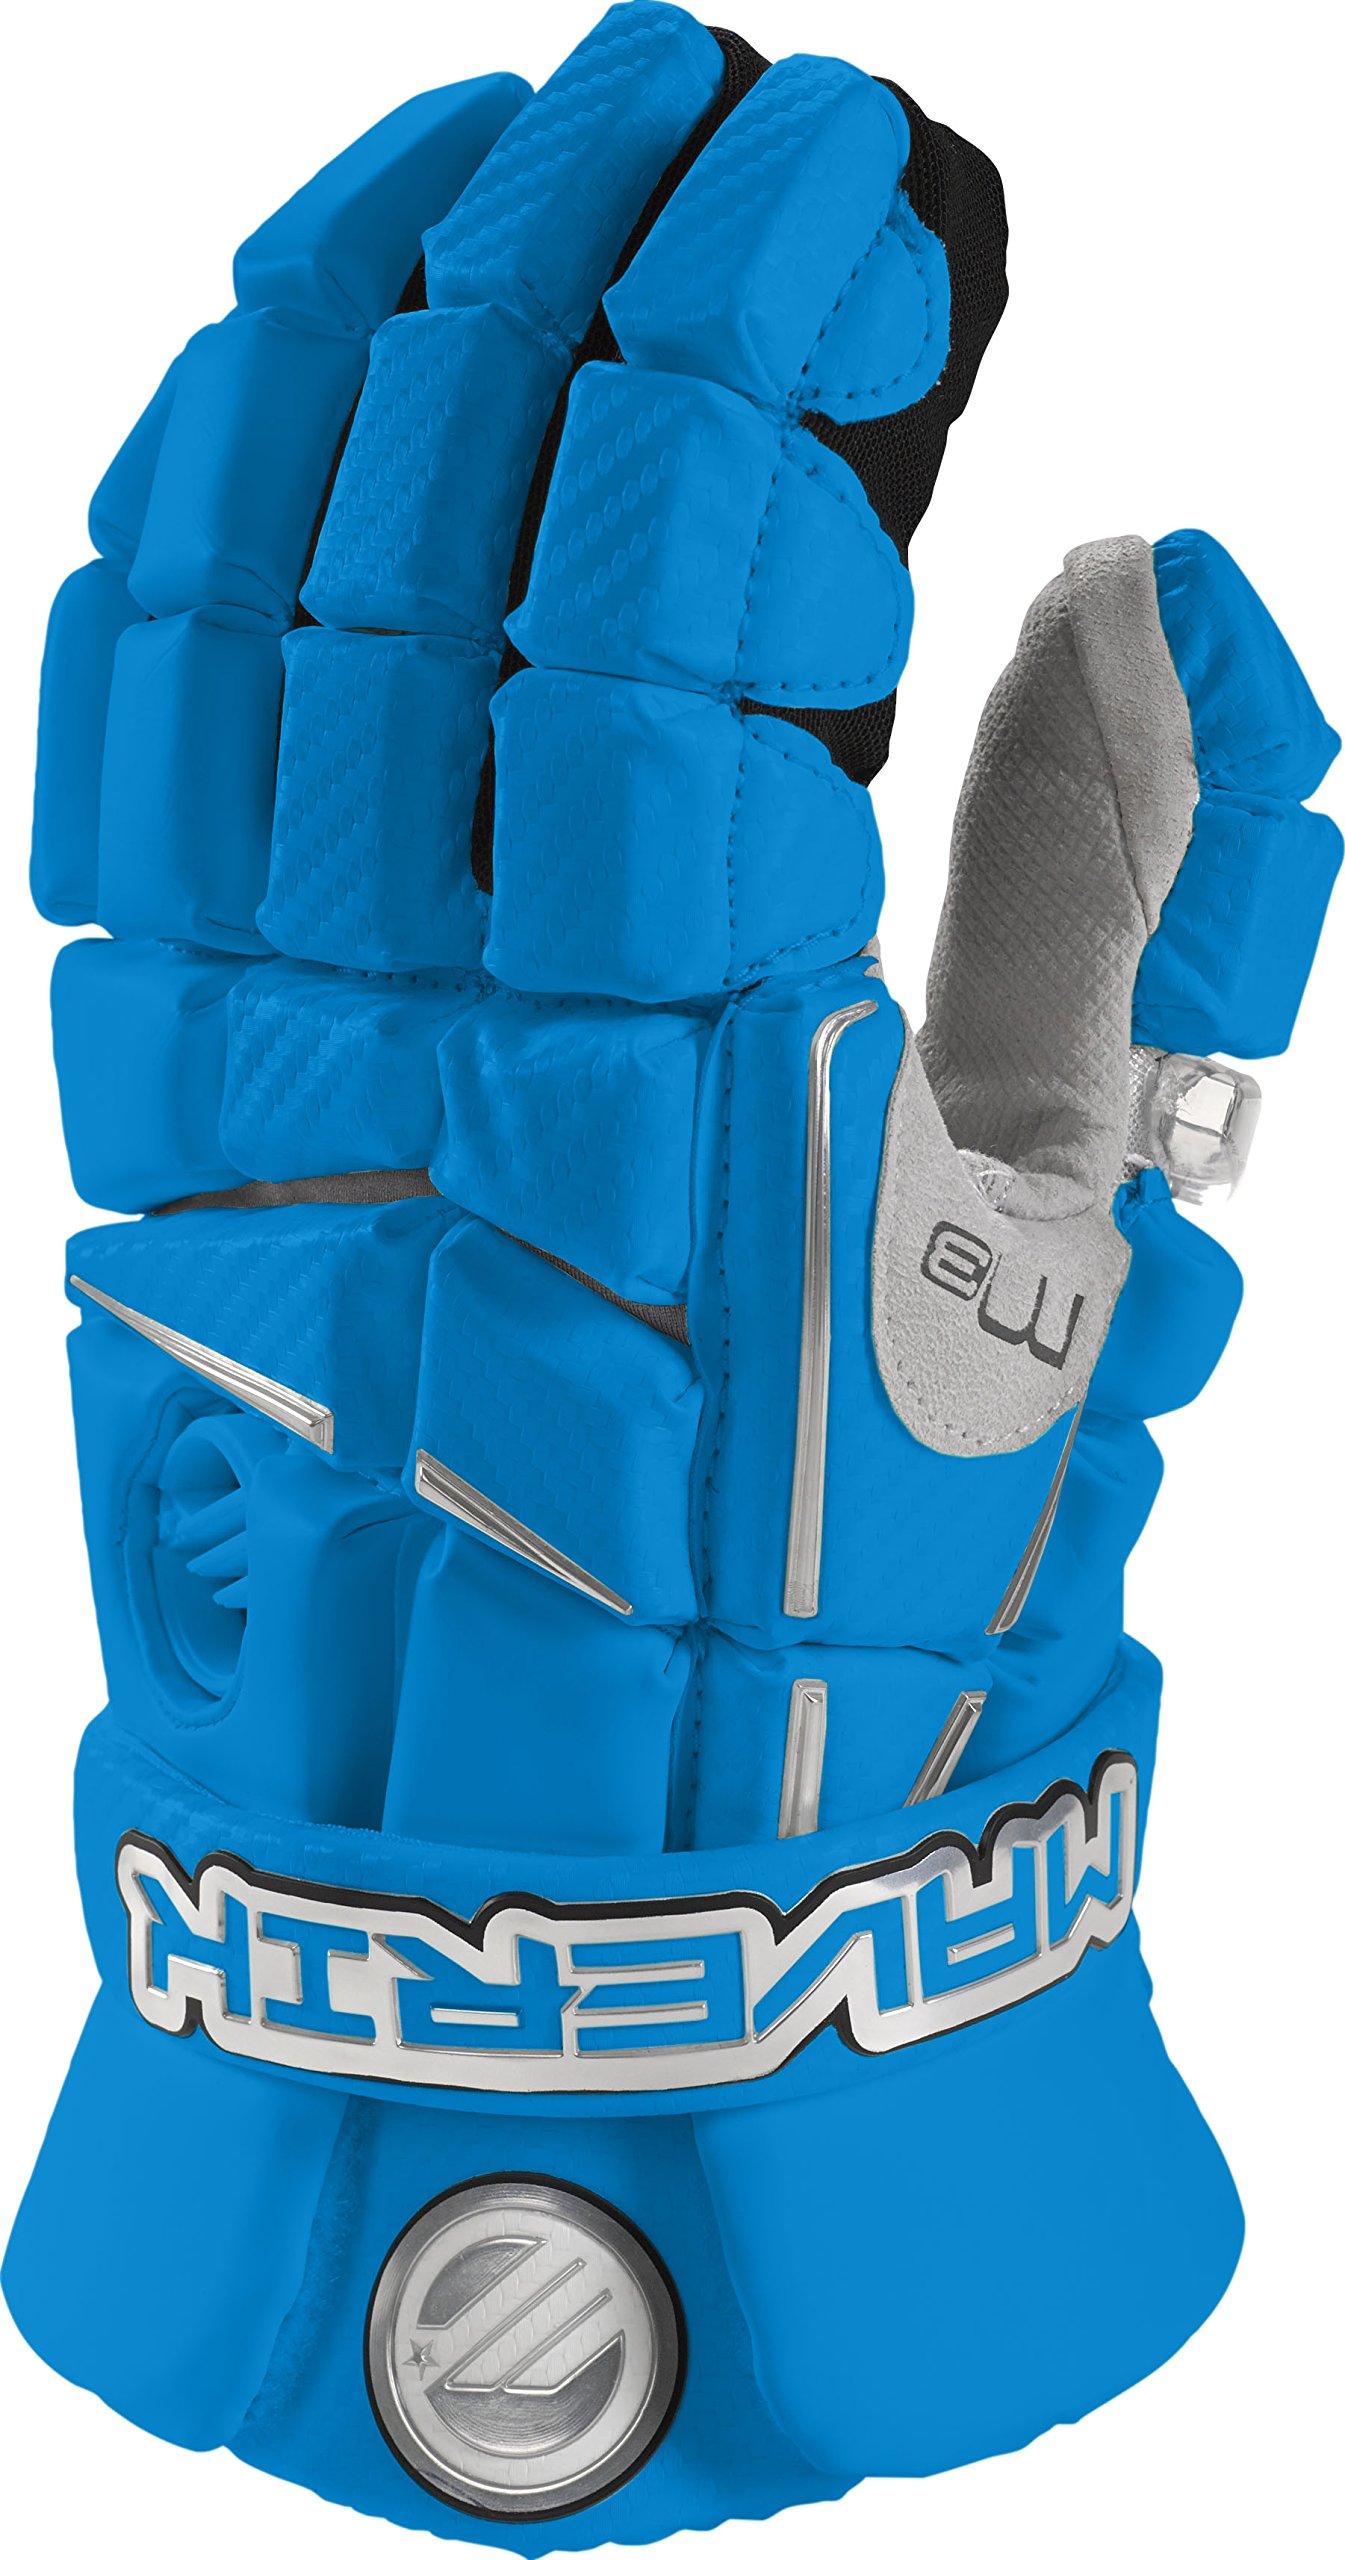 Maverik Lacrosse M3 Glove, Royal, Large